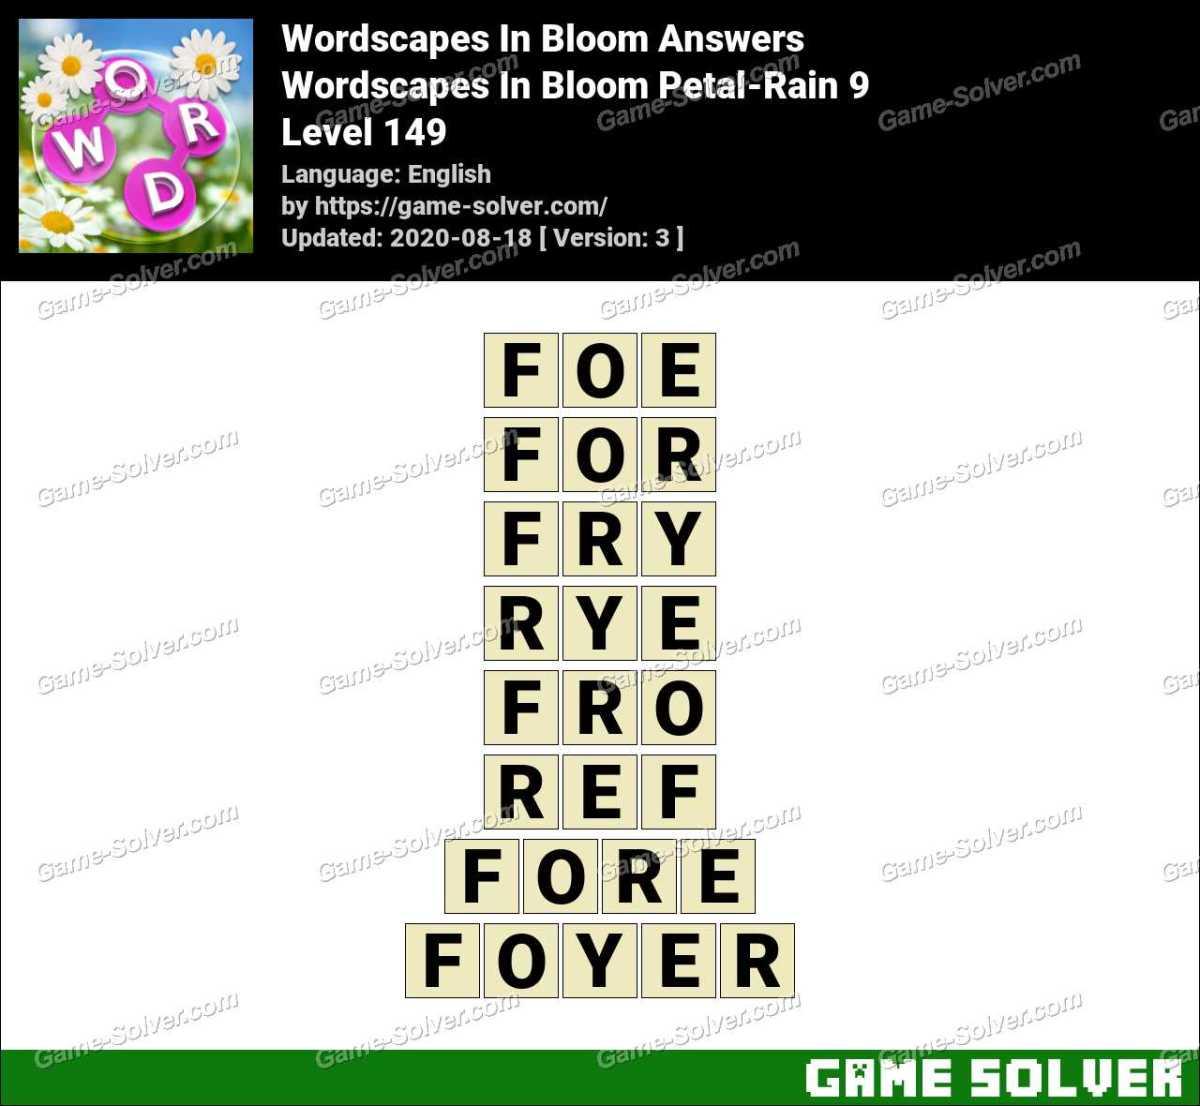 Download Wordscapes 149 Images